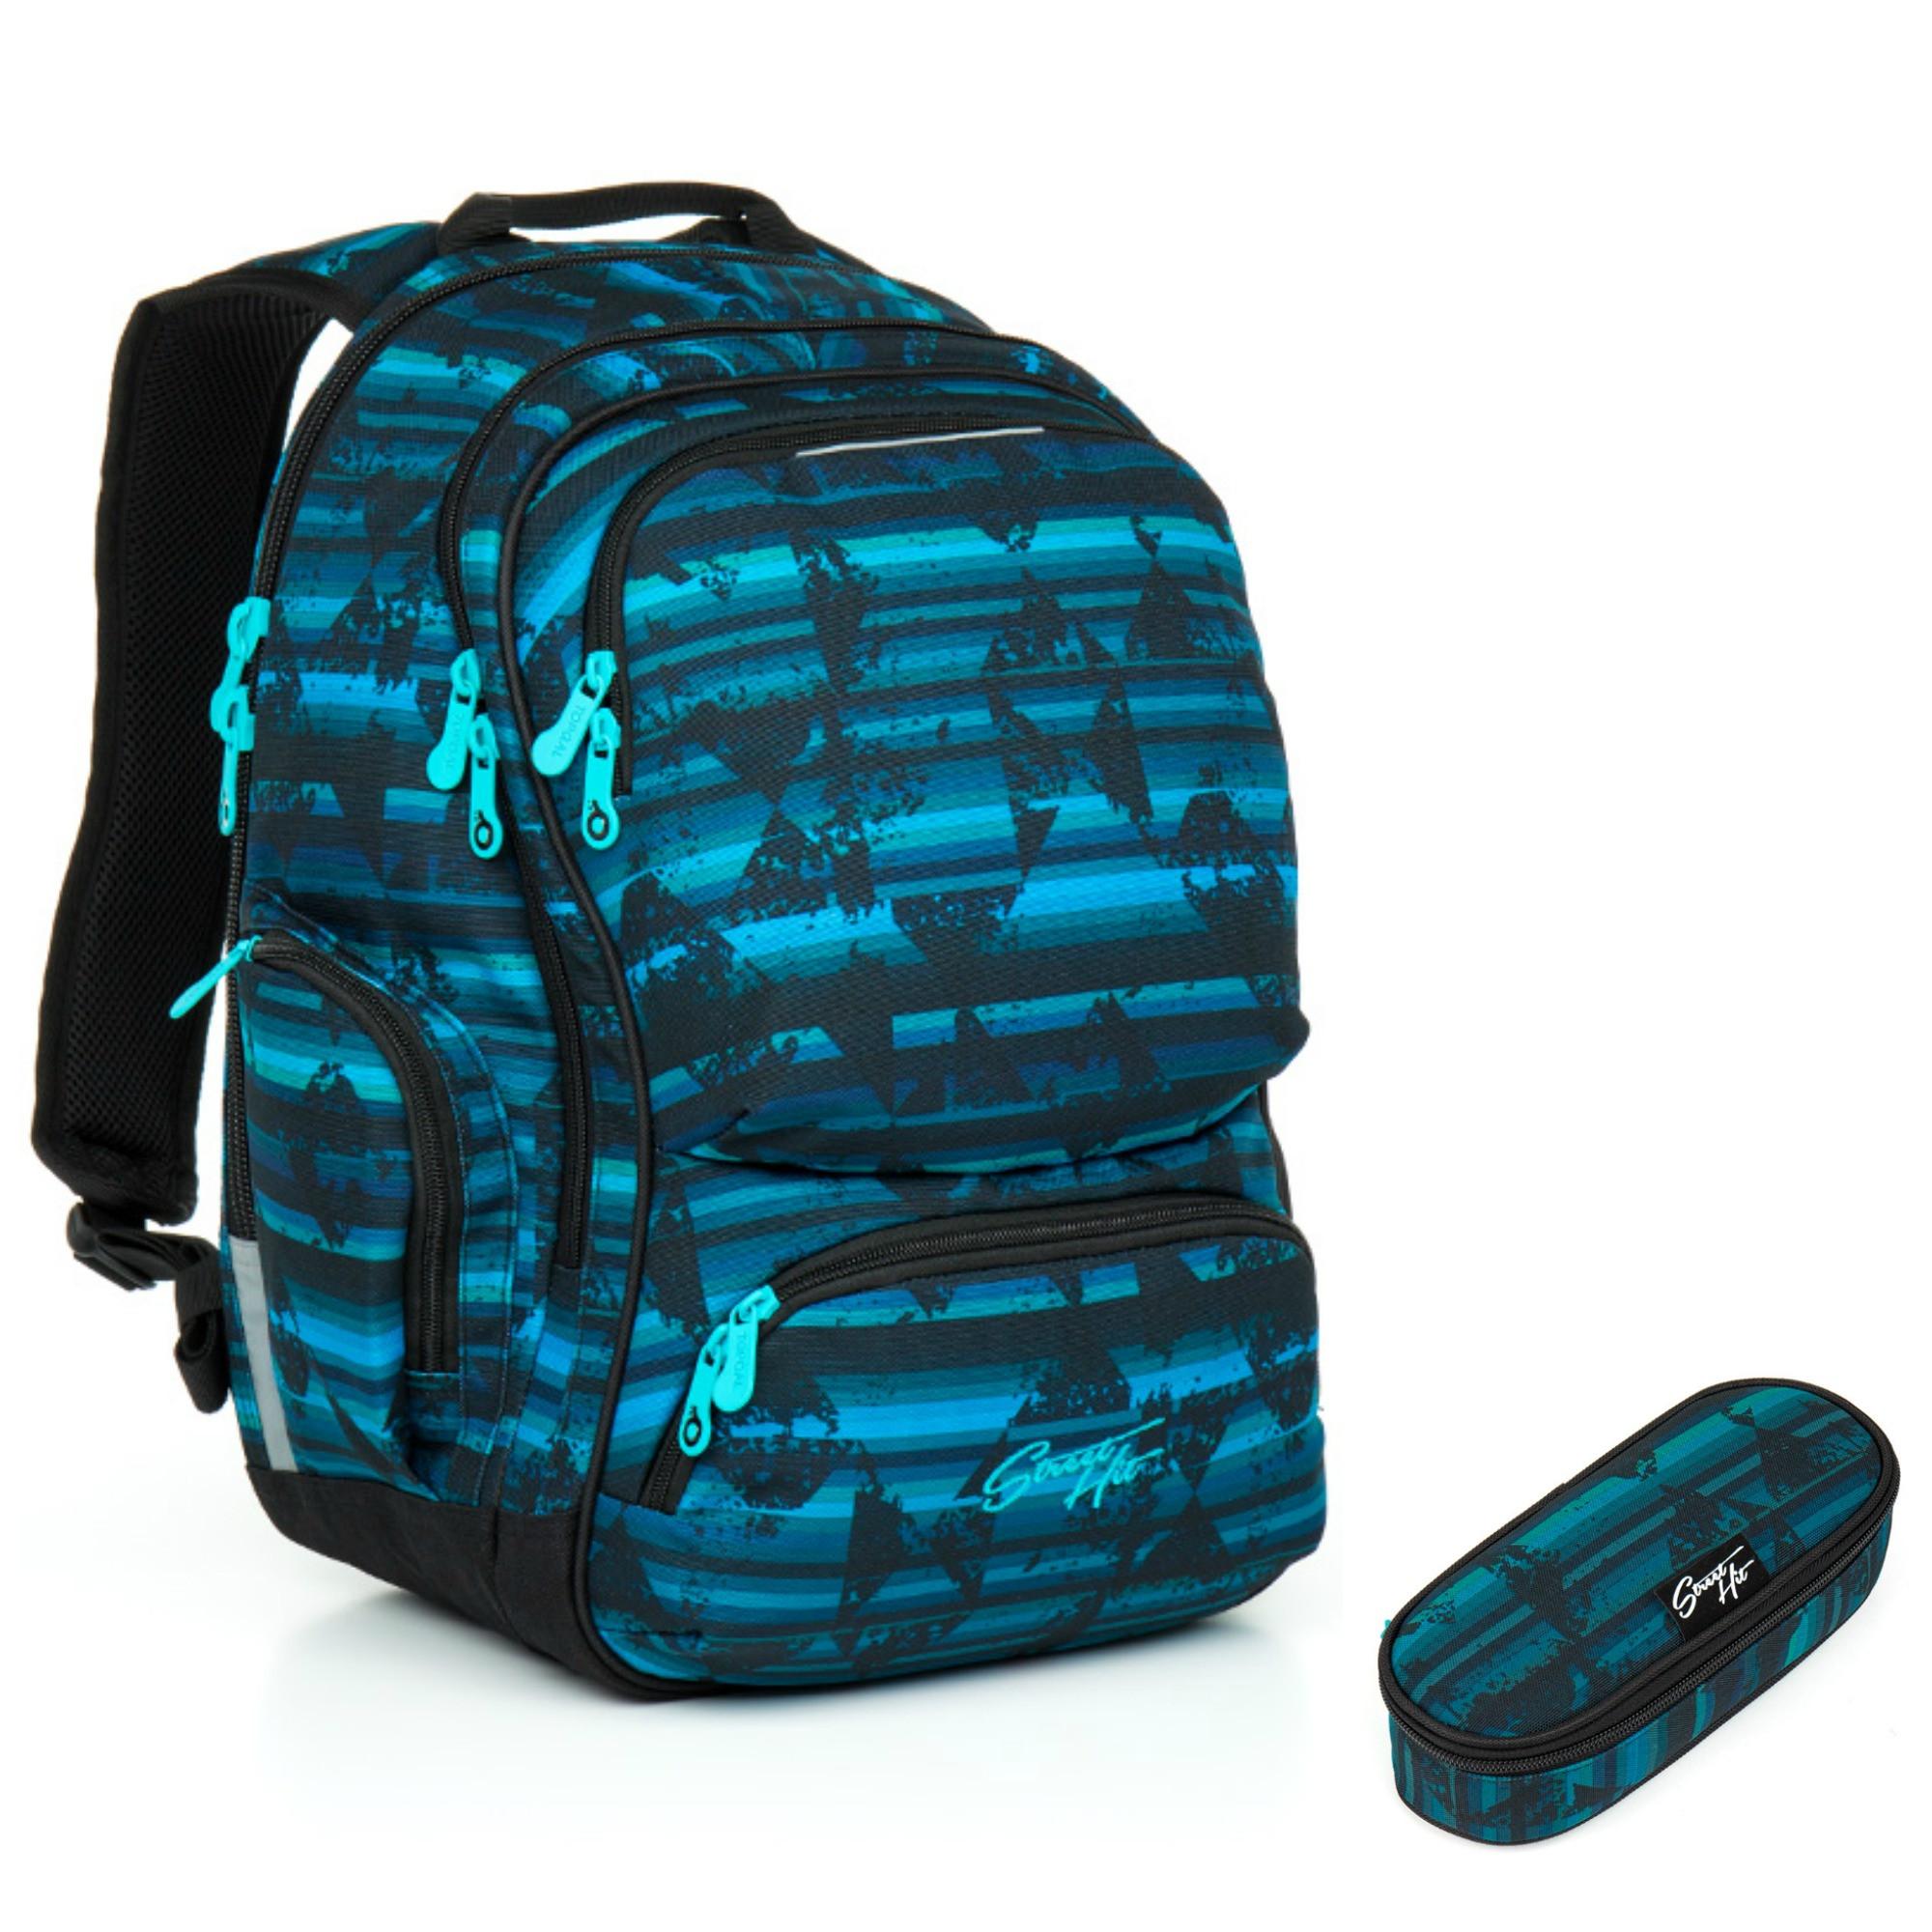 Studentský batoh a penál Topgal HIT 864 D + HIT 876 D  d4e9da59cf